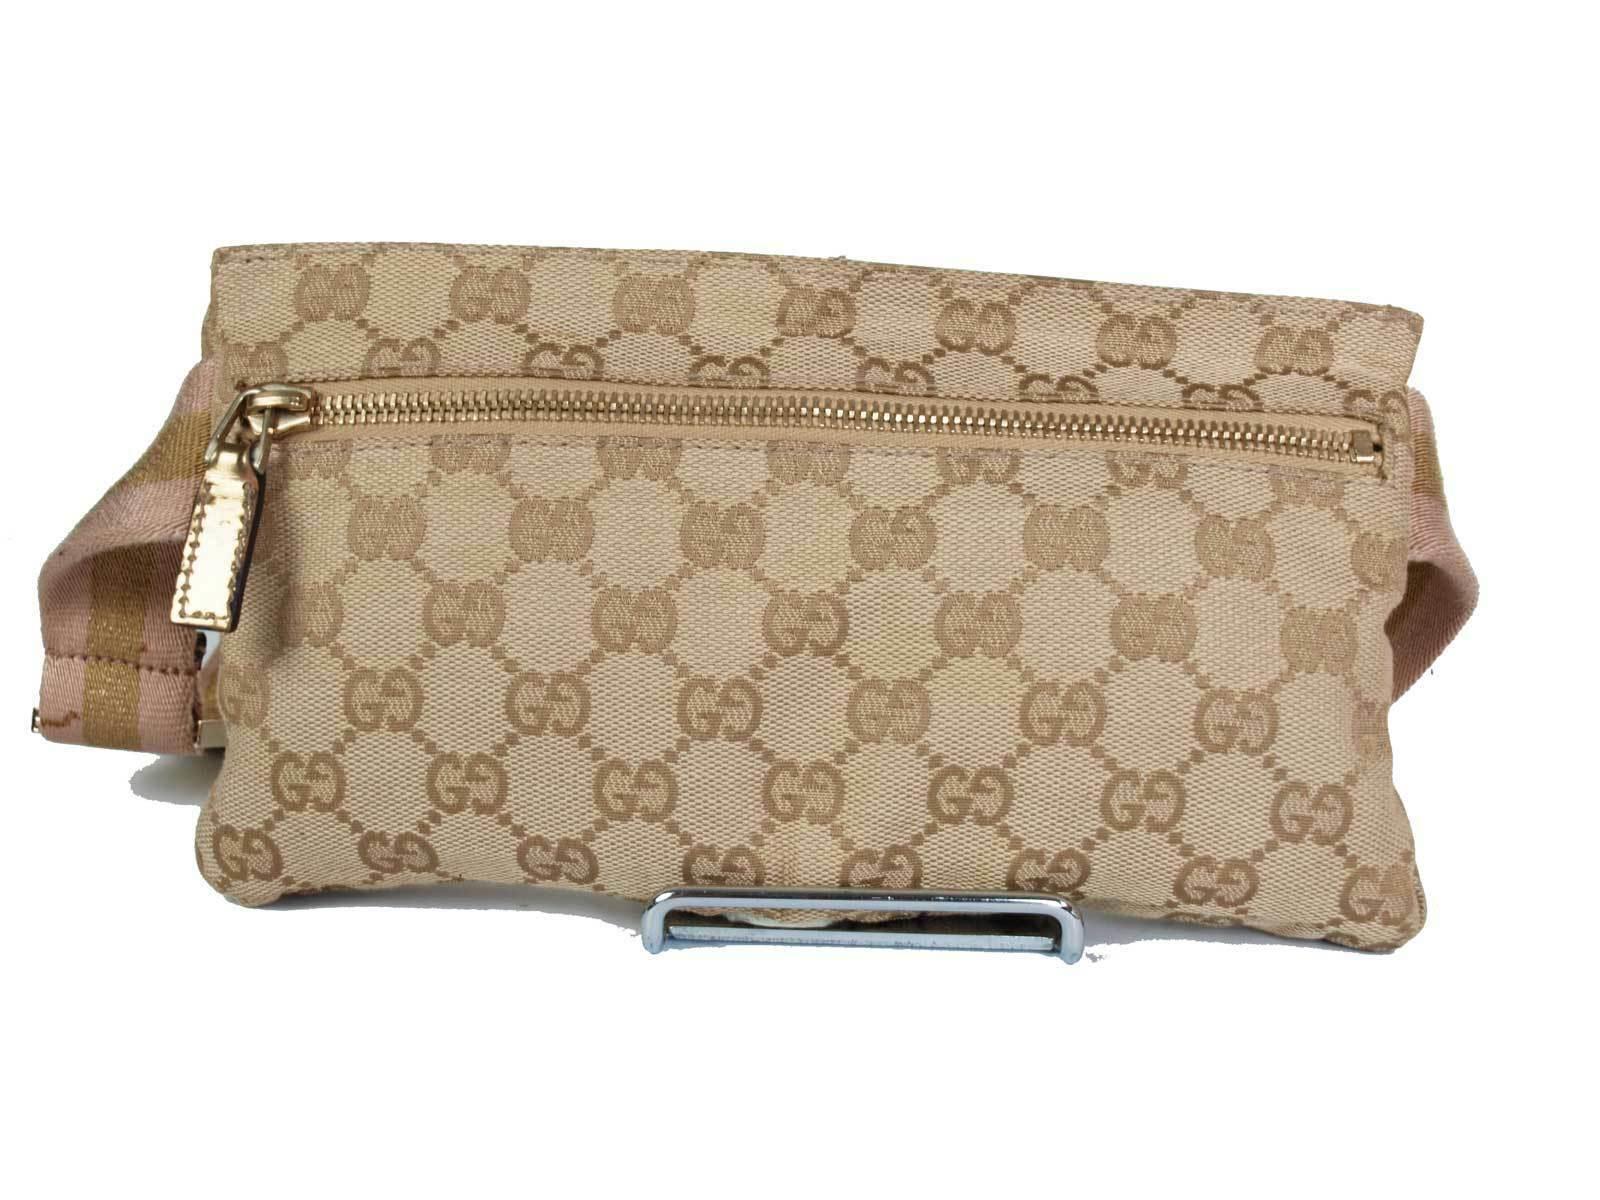 Authentic Gucci GG Pattern Canvas Leather Browns Waist Belt Bag GW1808